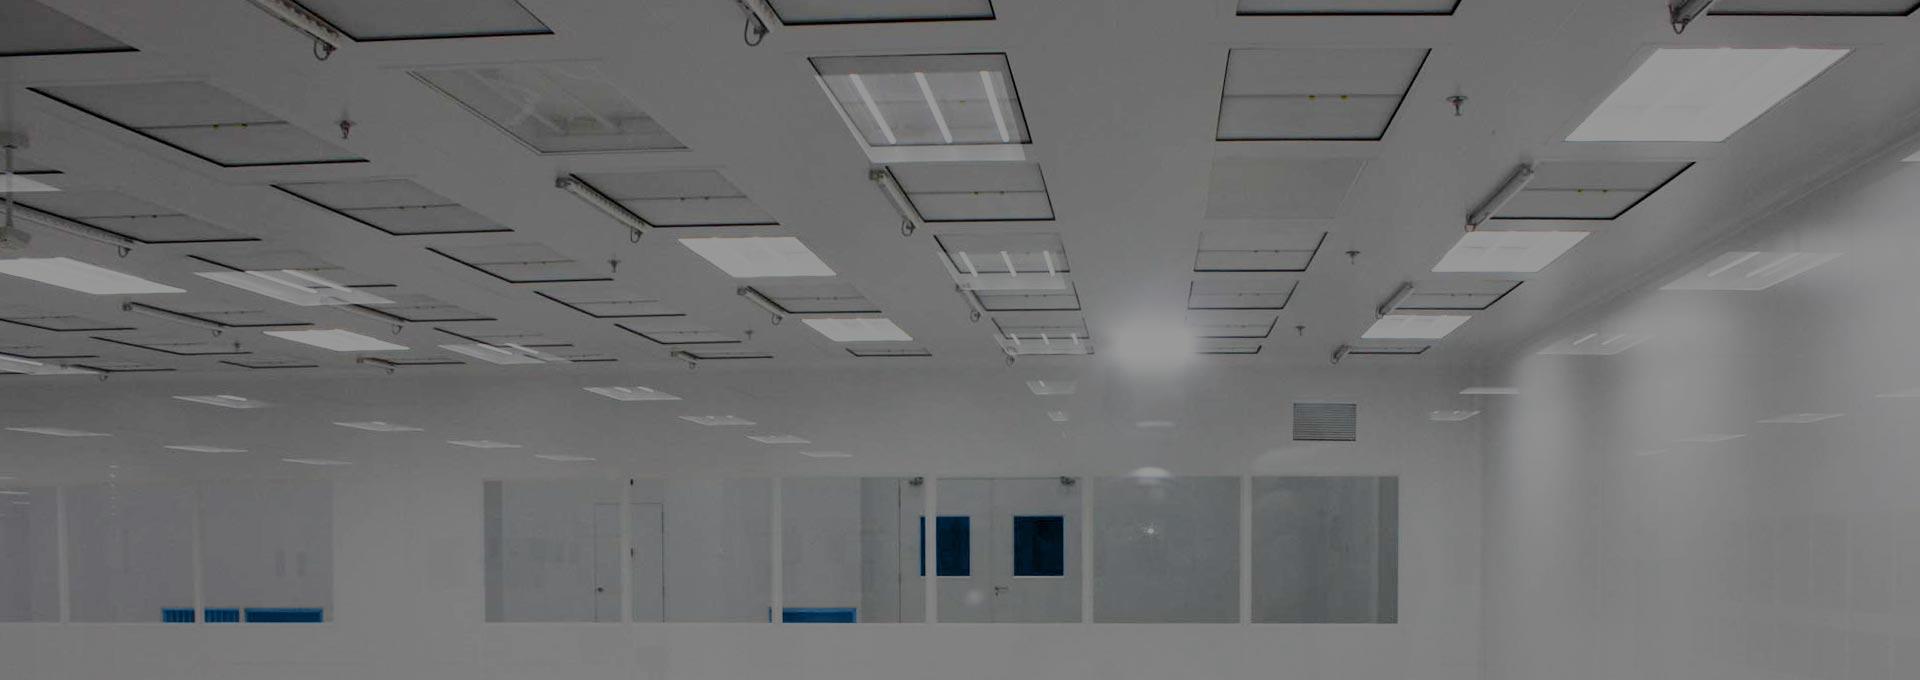 Ceiling-Grid-System-2